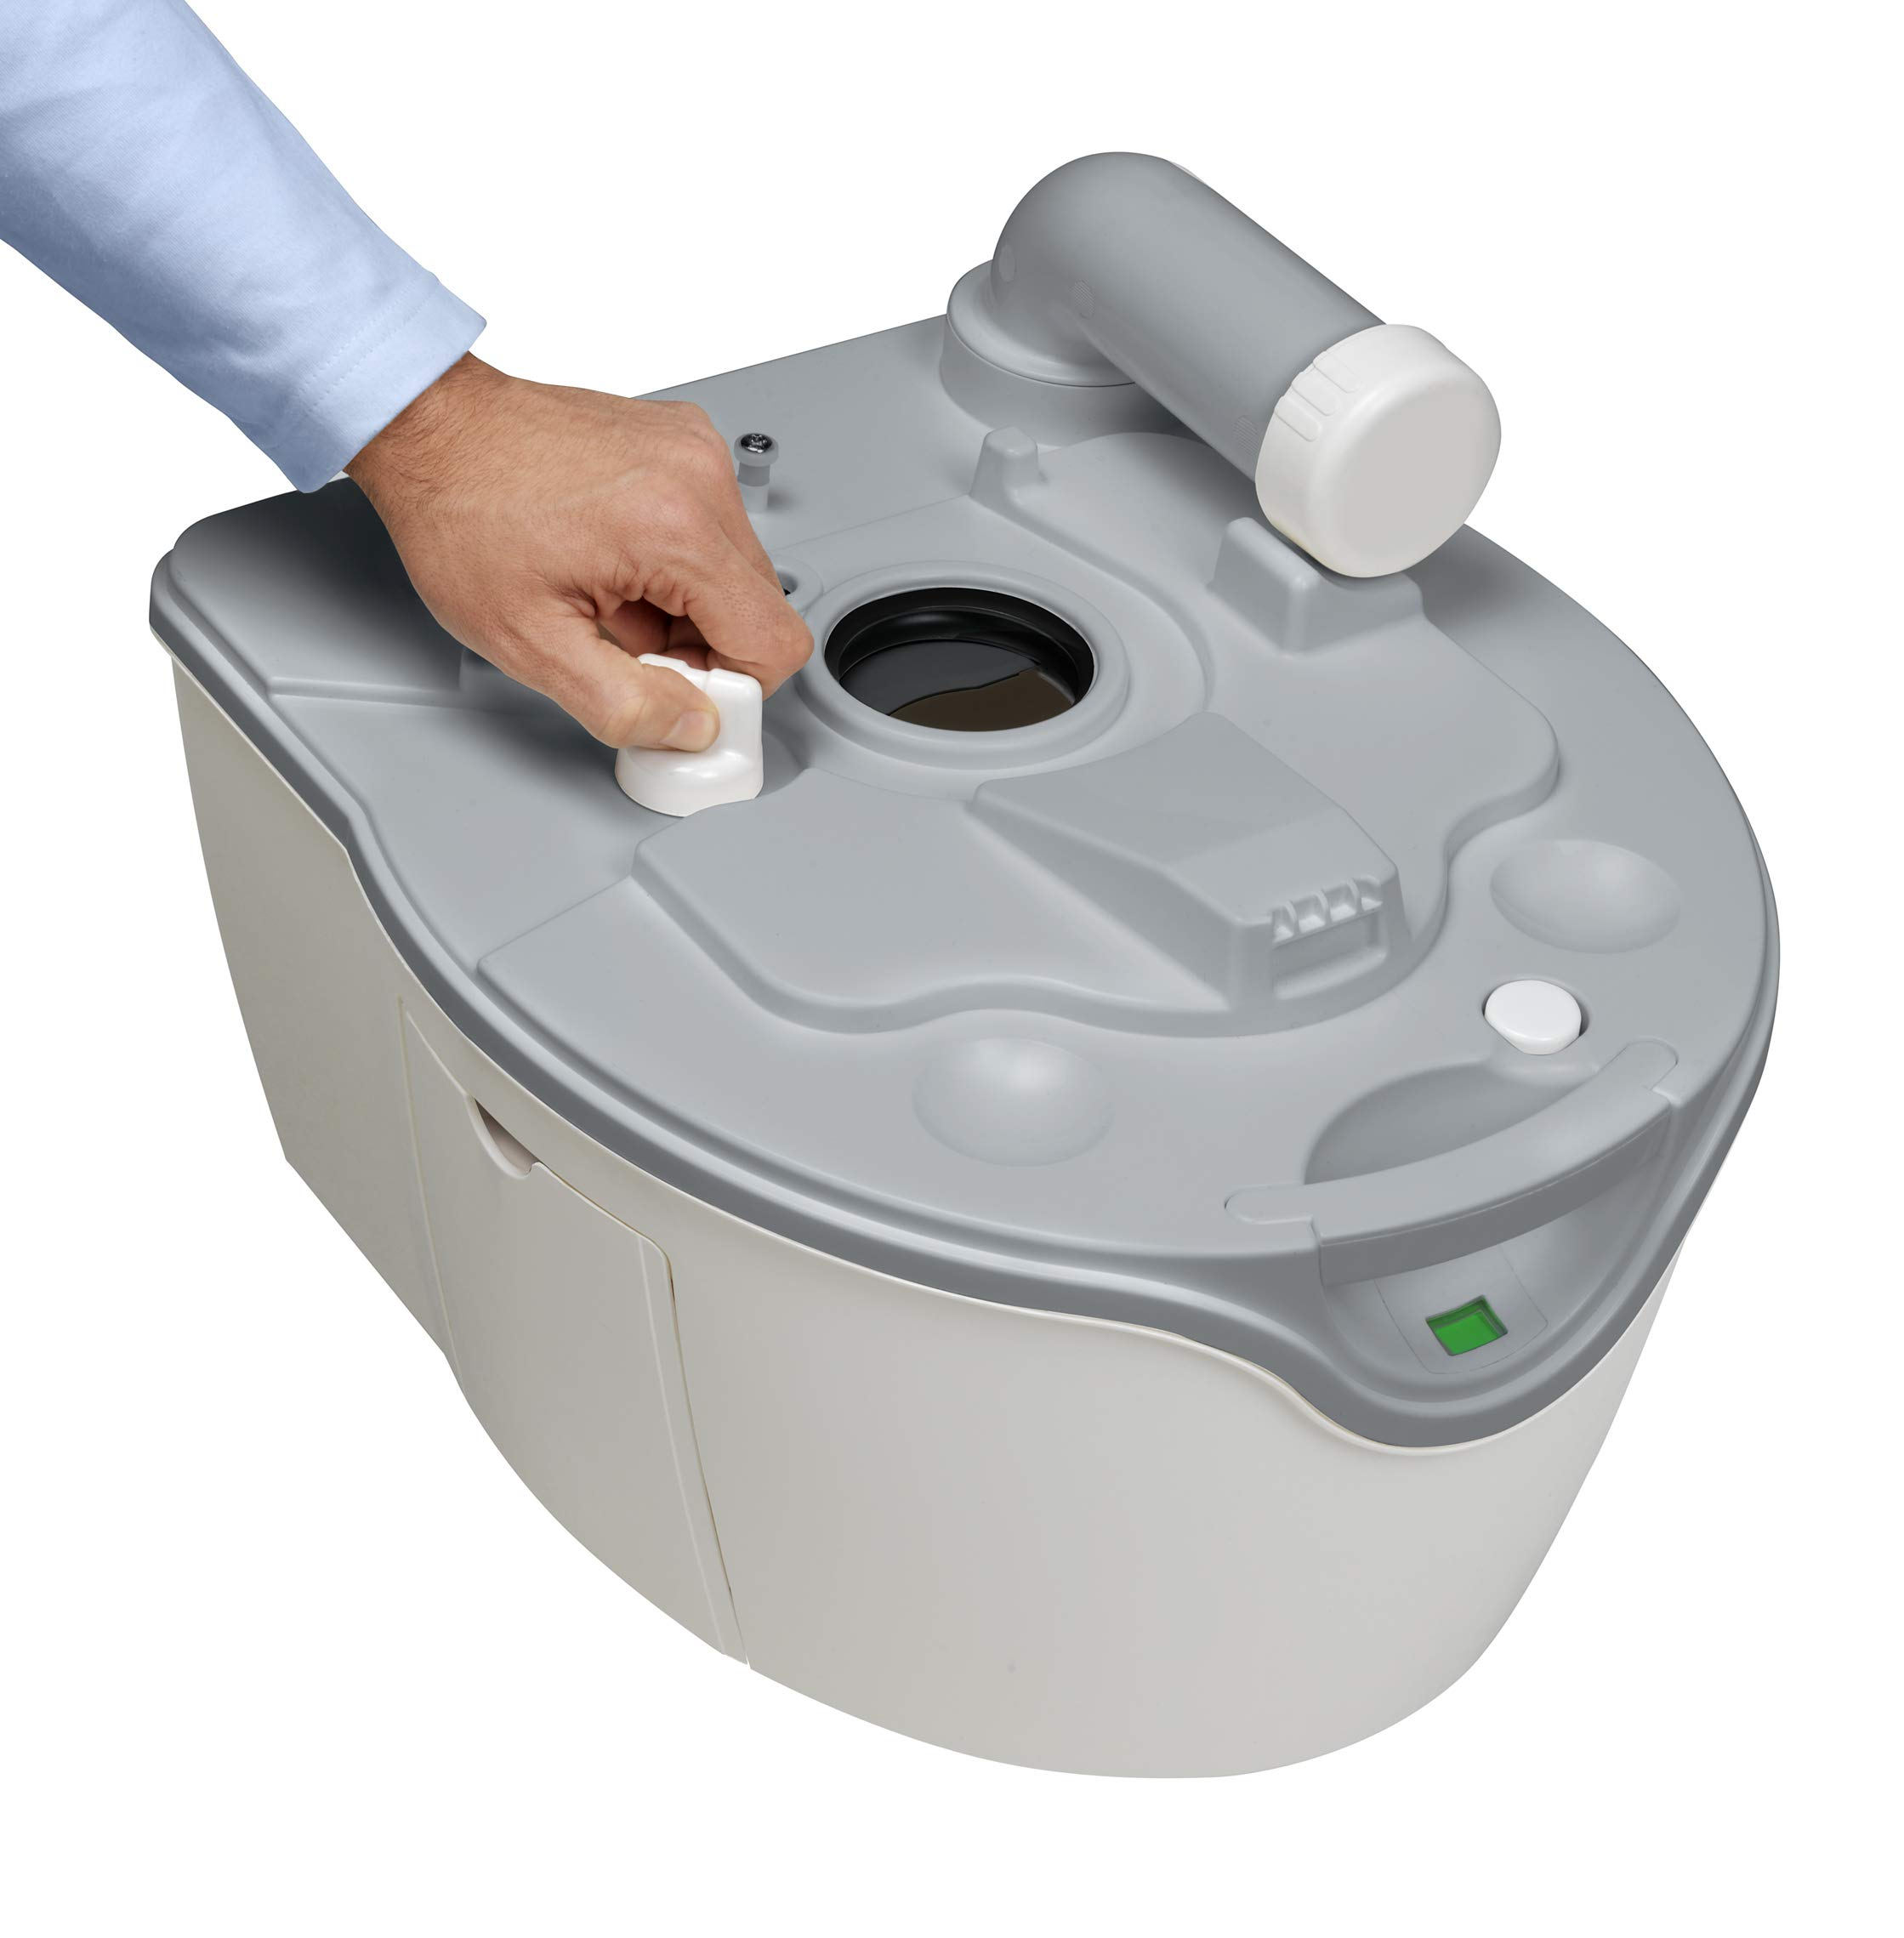 Thetford 92305 Porta Potti 565P Excellence Portable Toilet (Manual), 448 x 388 x 450 mm 4